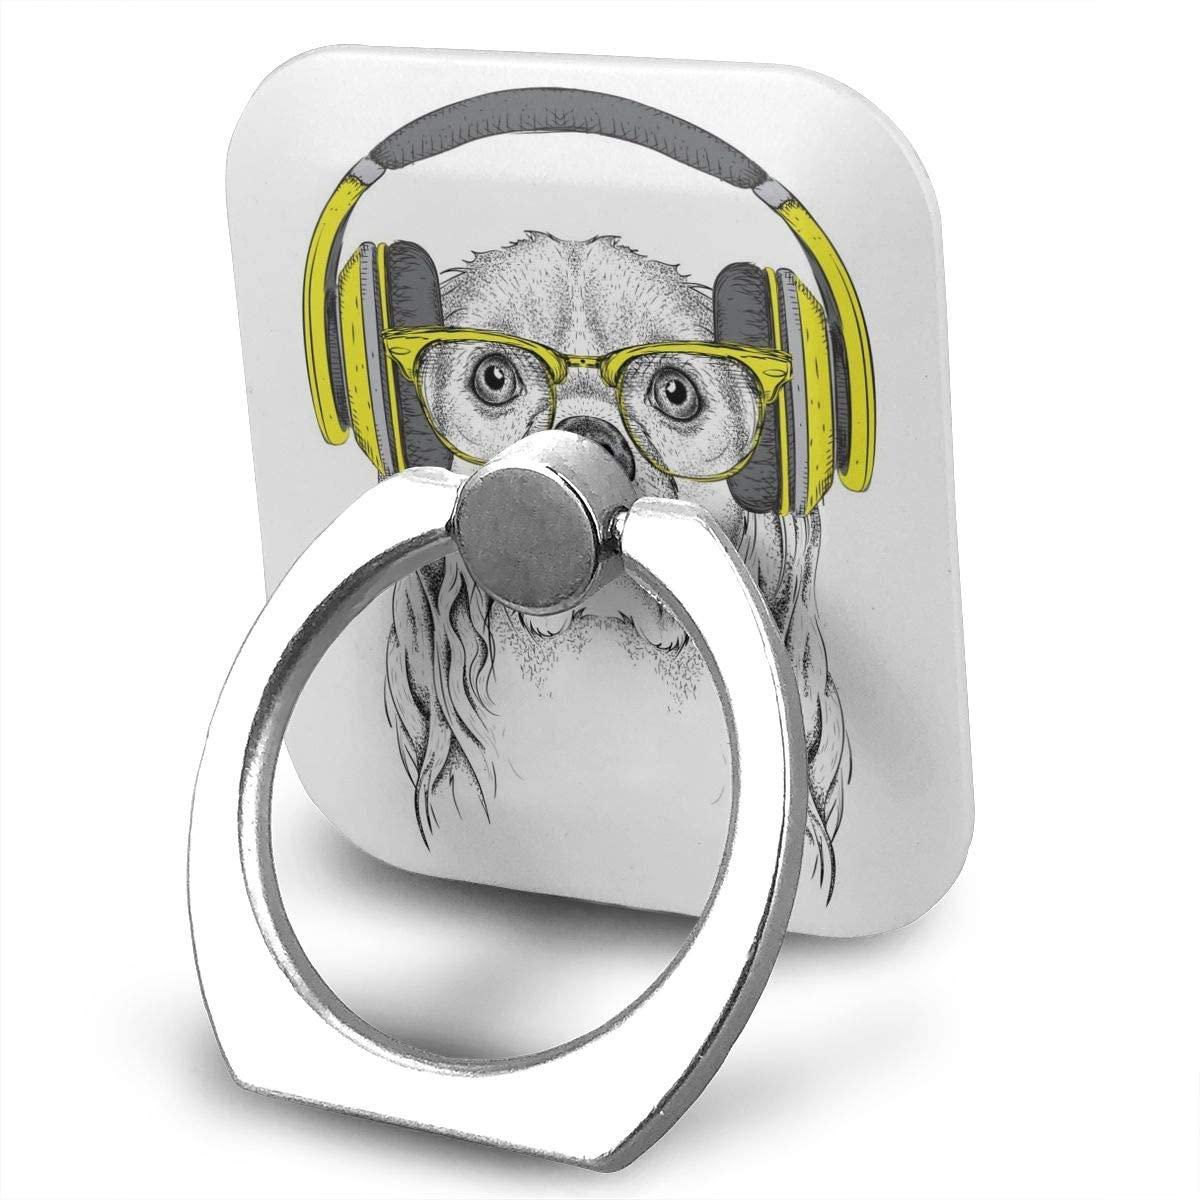 SLHFPX Cell Phone Ring Holder Stand Hip-Hop Dj Cocker Spaniel Dog in Glasses, Headphones Adjustable 360°Rotation Square Universal Finger Grip Loop Silver Metal Phone Holder for Women Kids Men Ladies